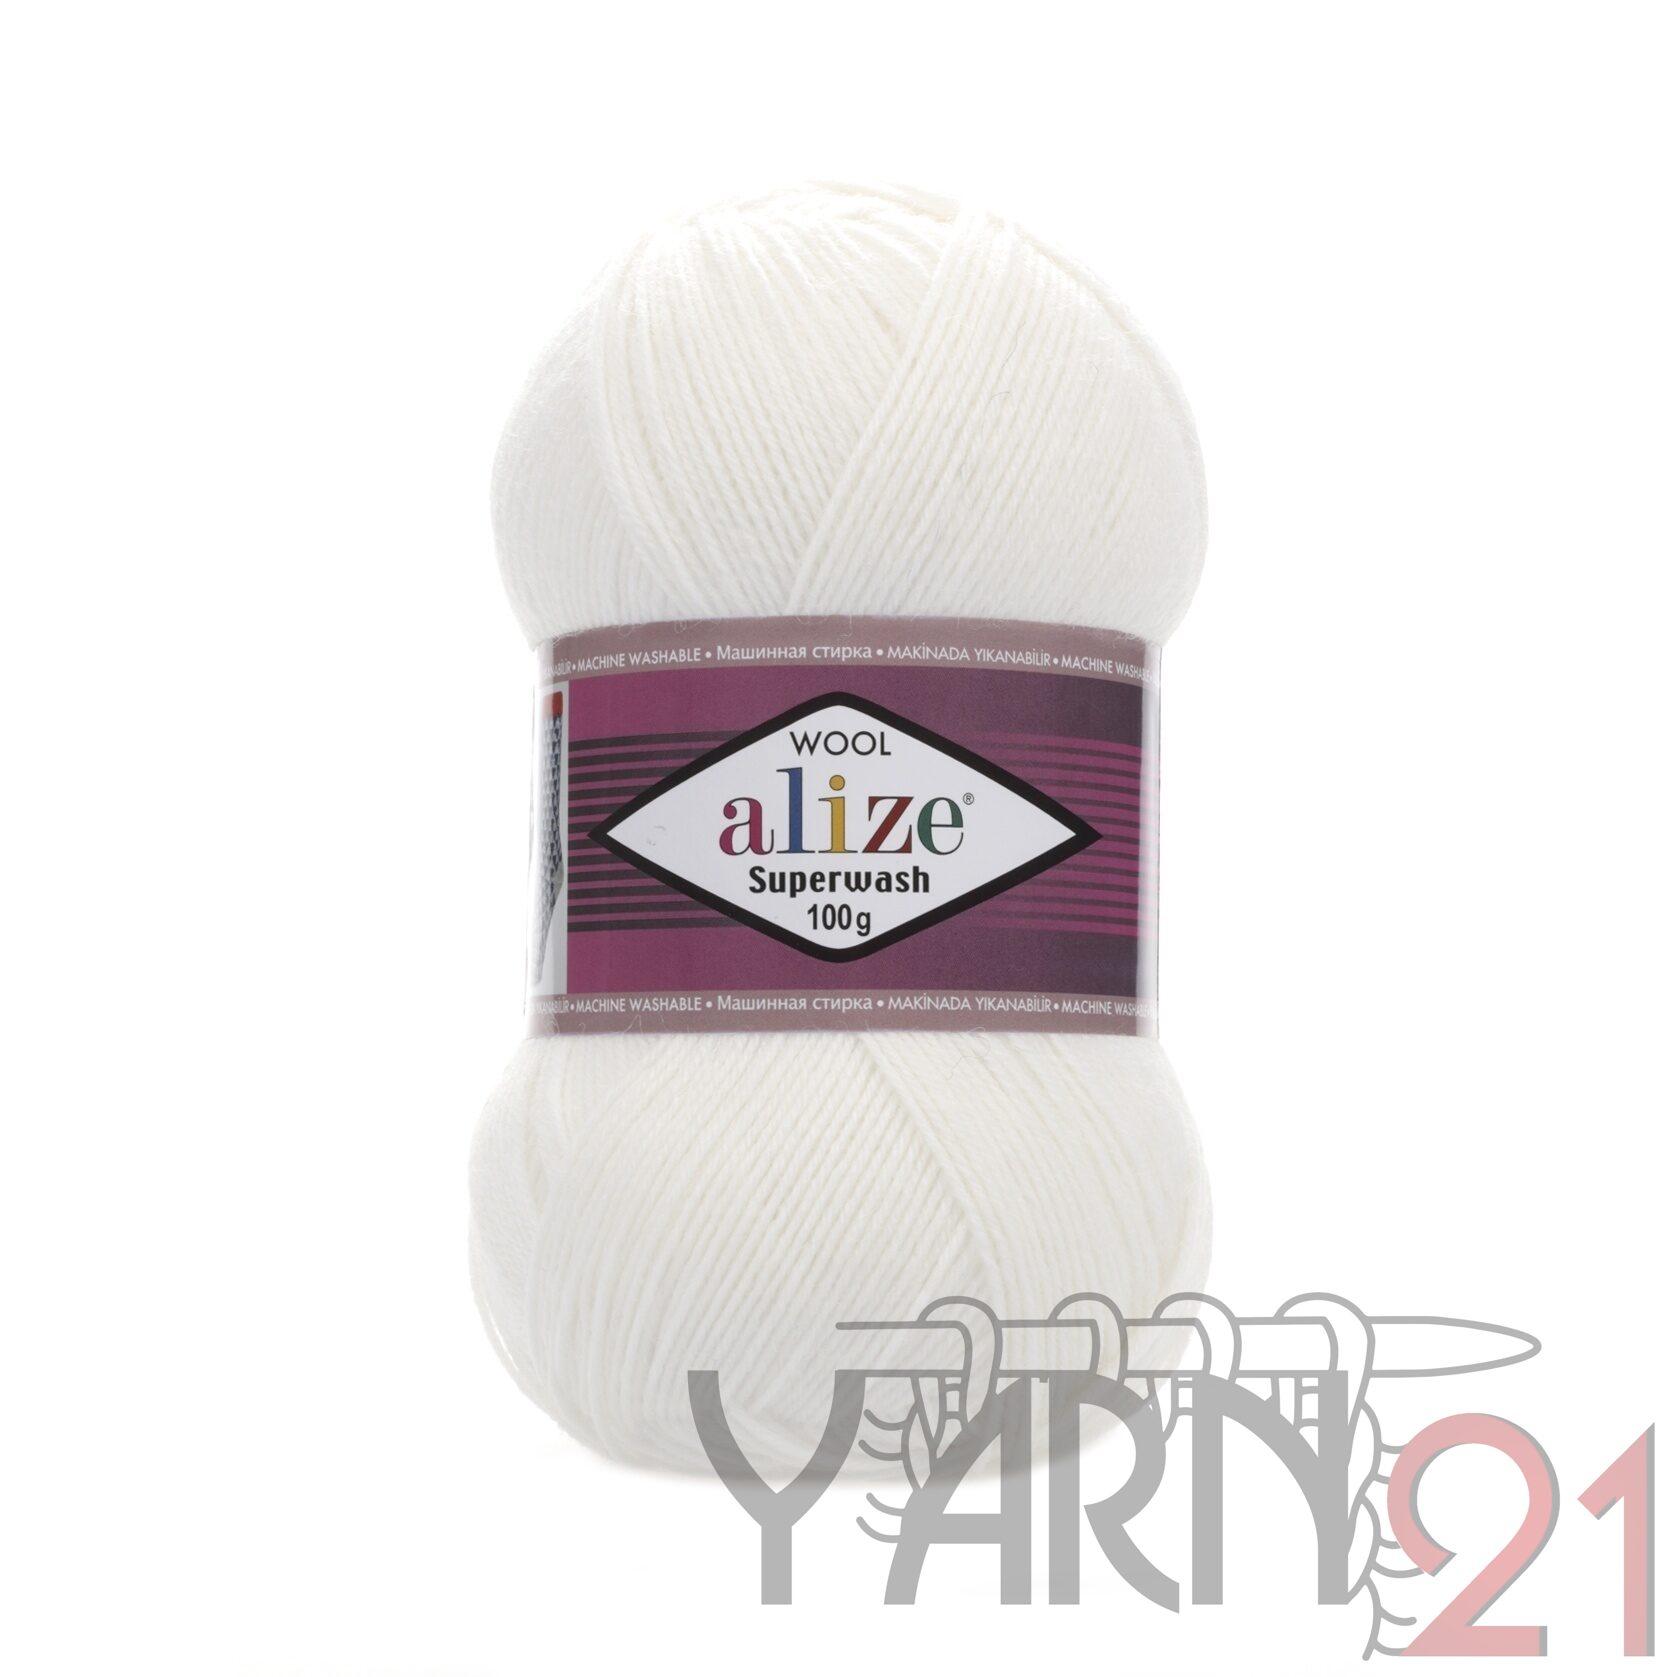 SUPERWASH 100 №55 — цвет  — интернет-магазин Yarn21